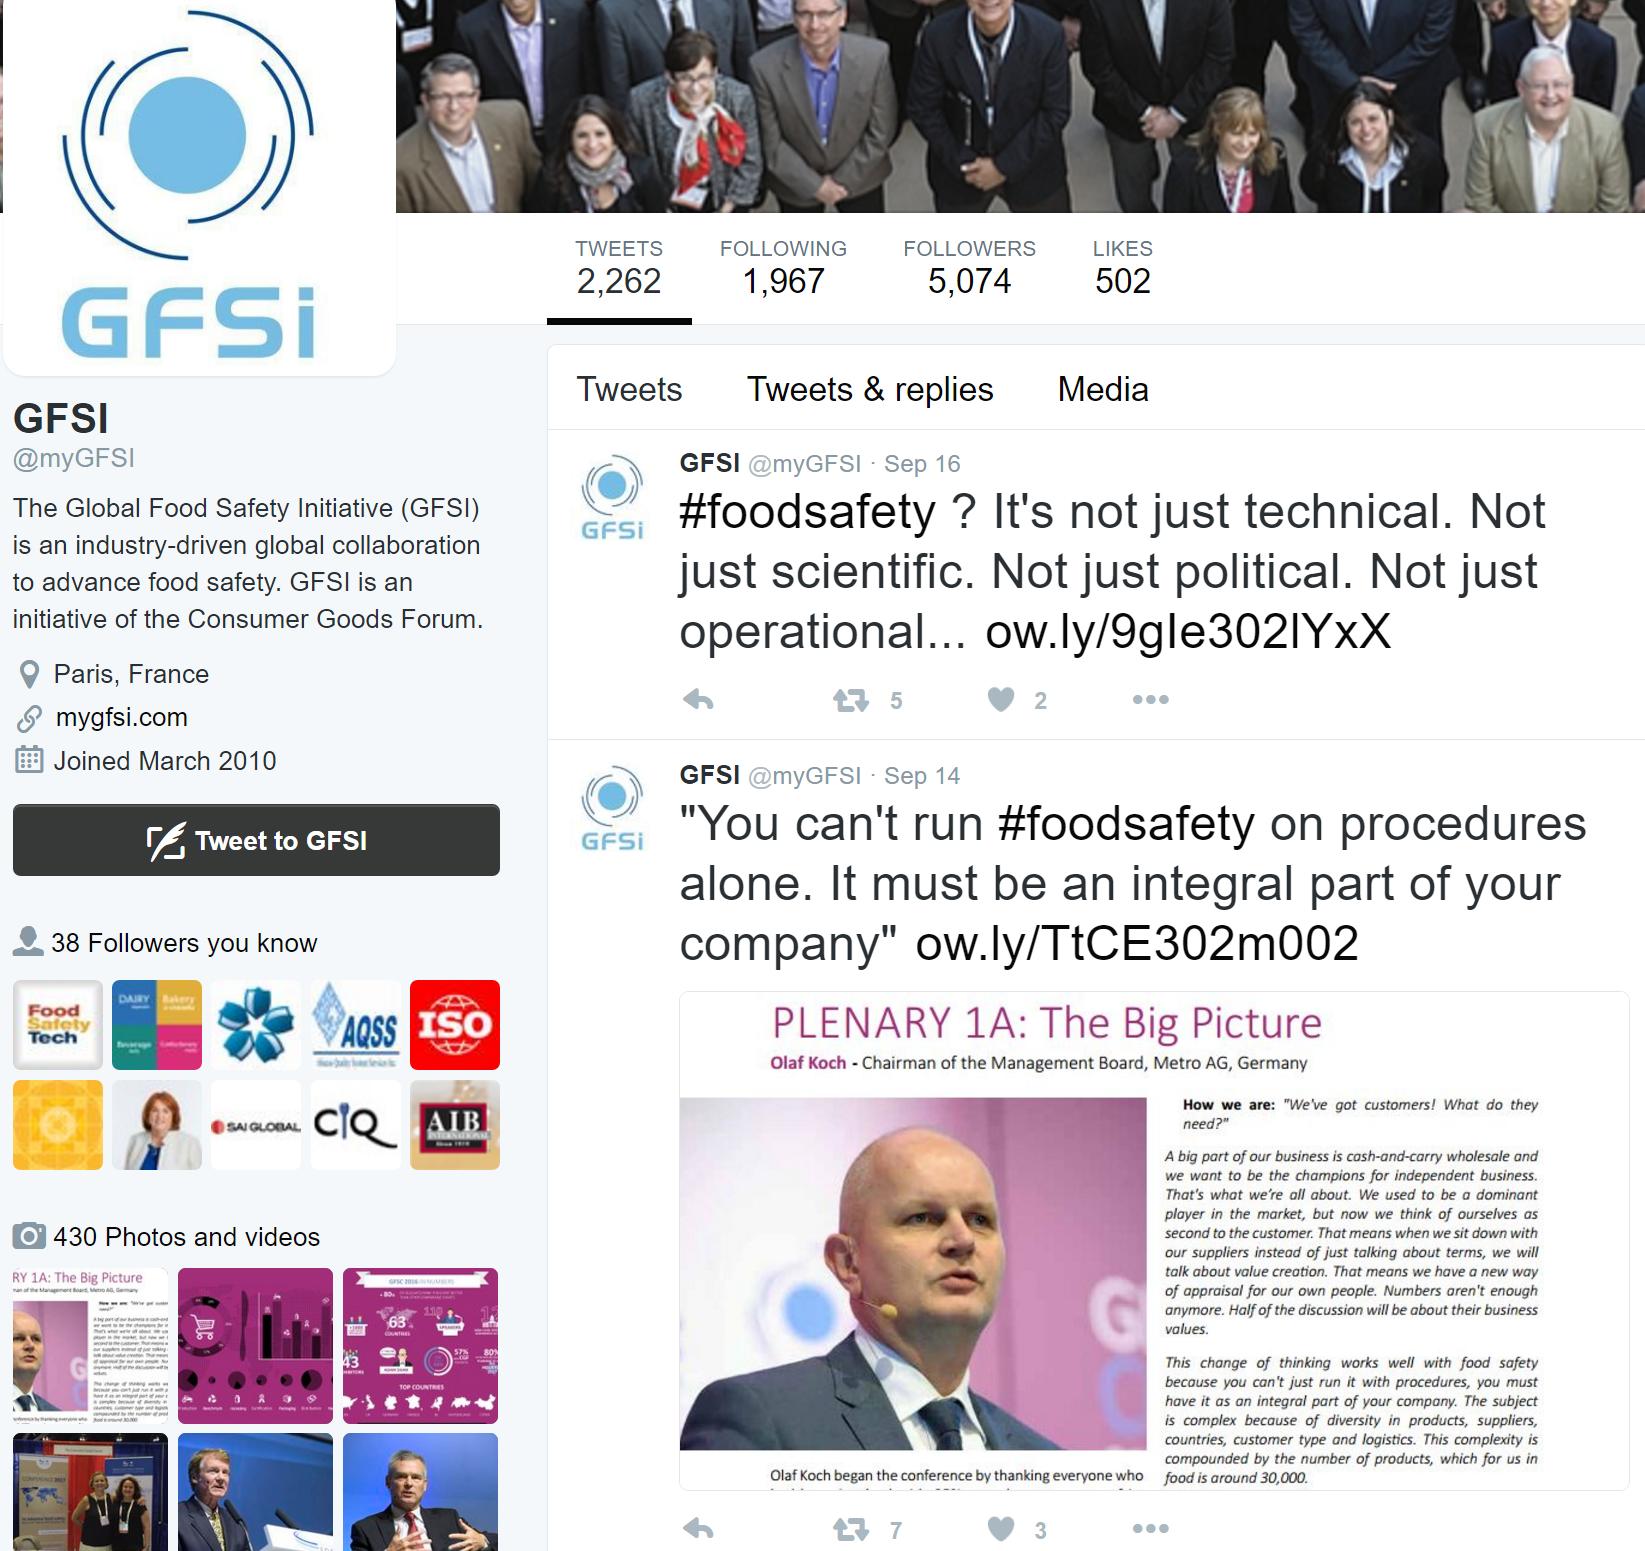 food_safety_news_GFSI.png